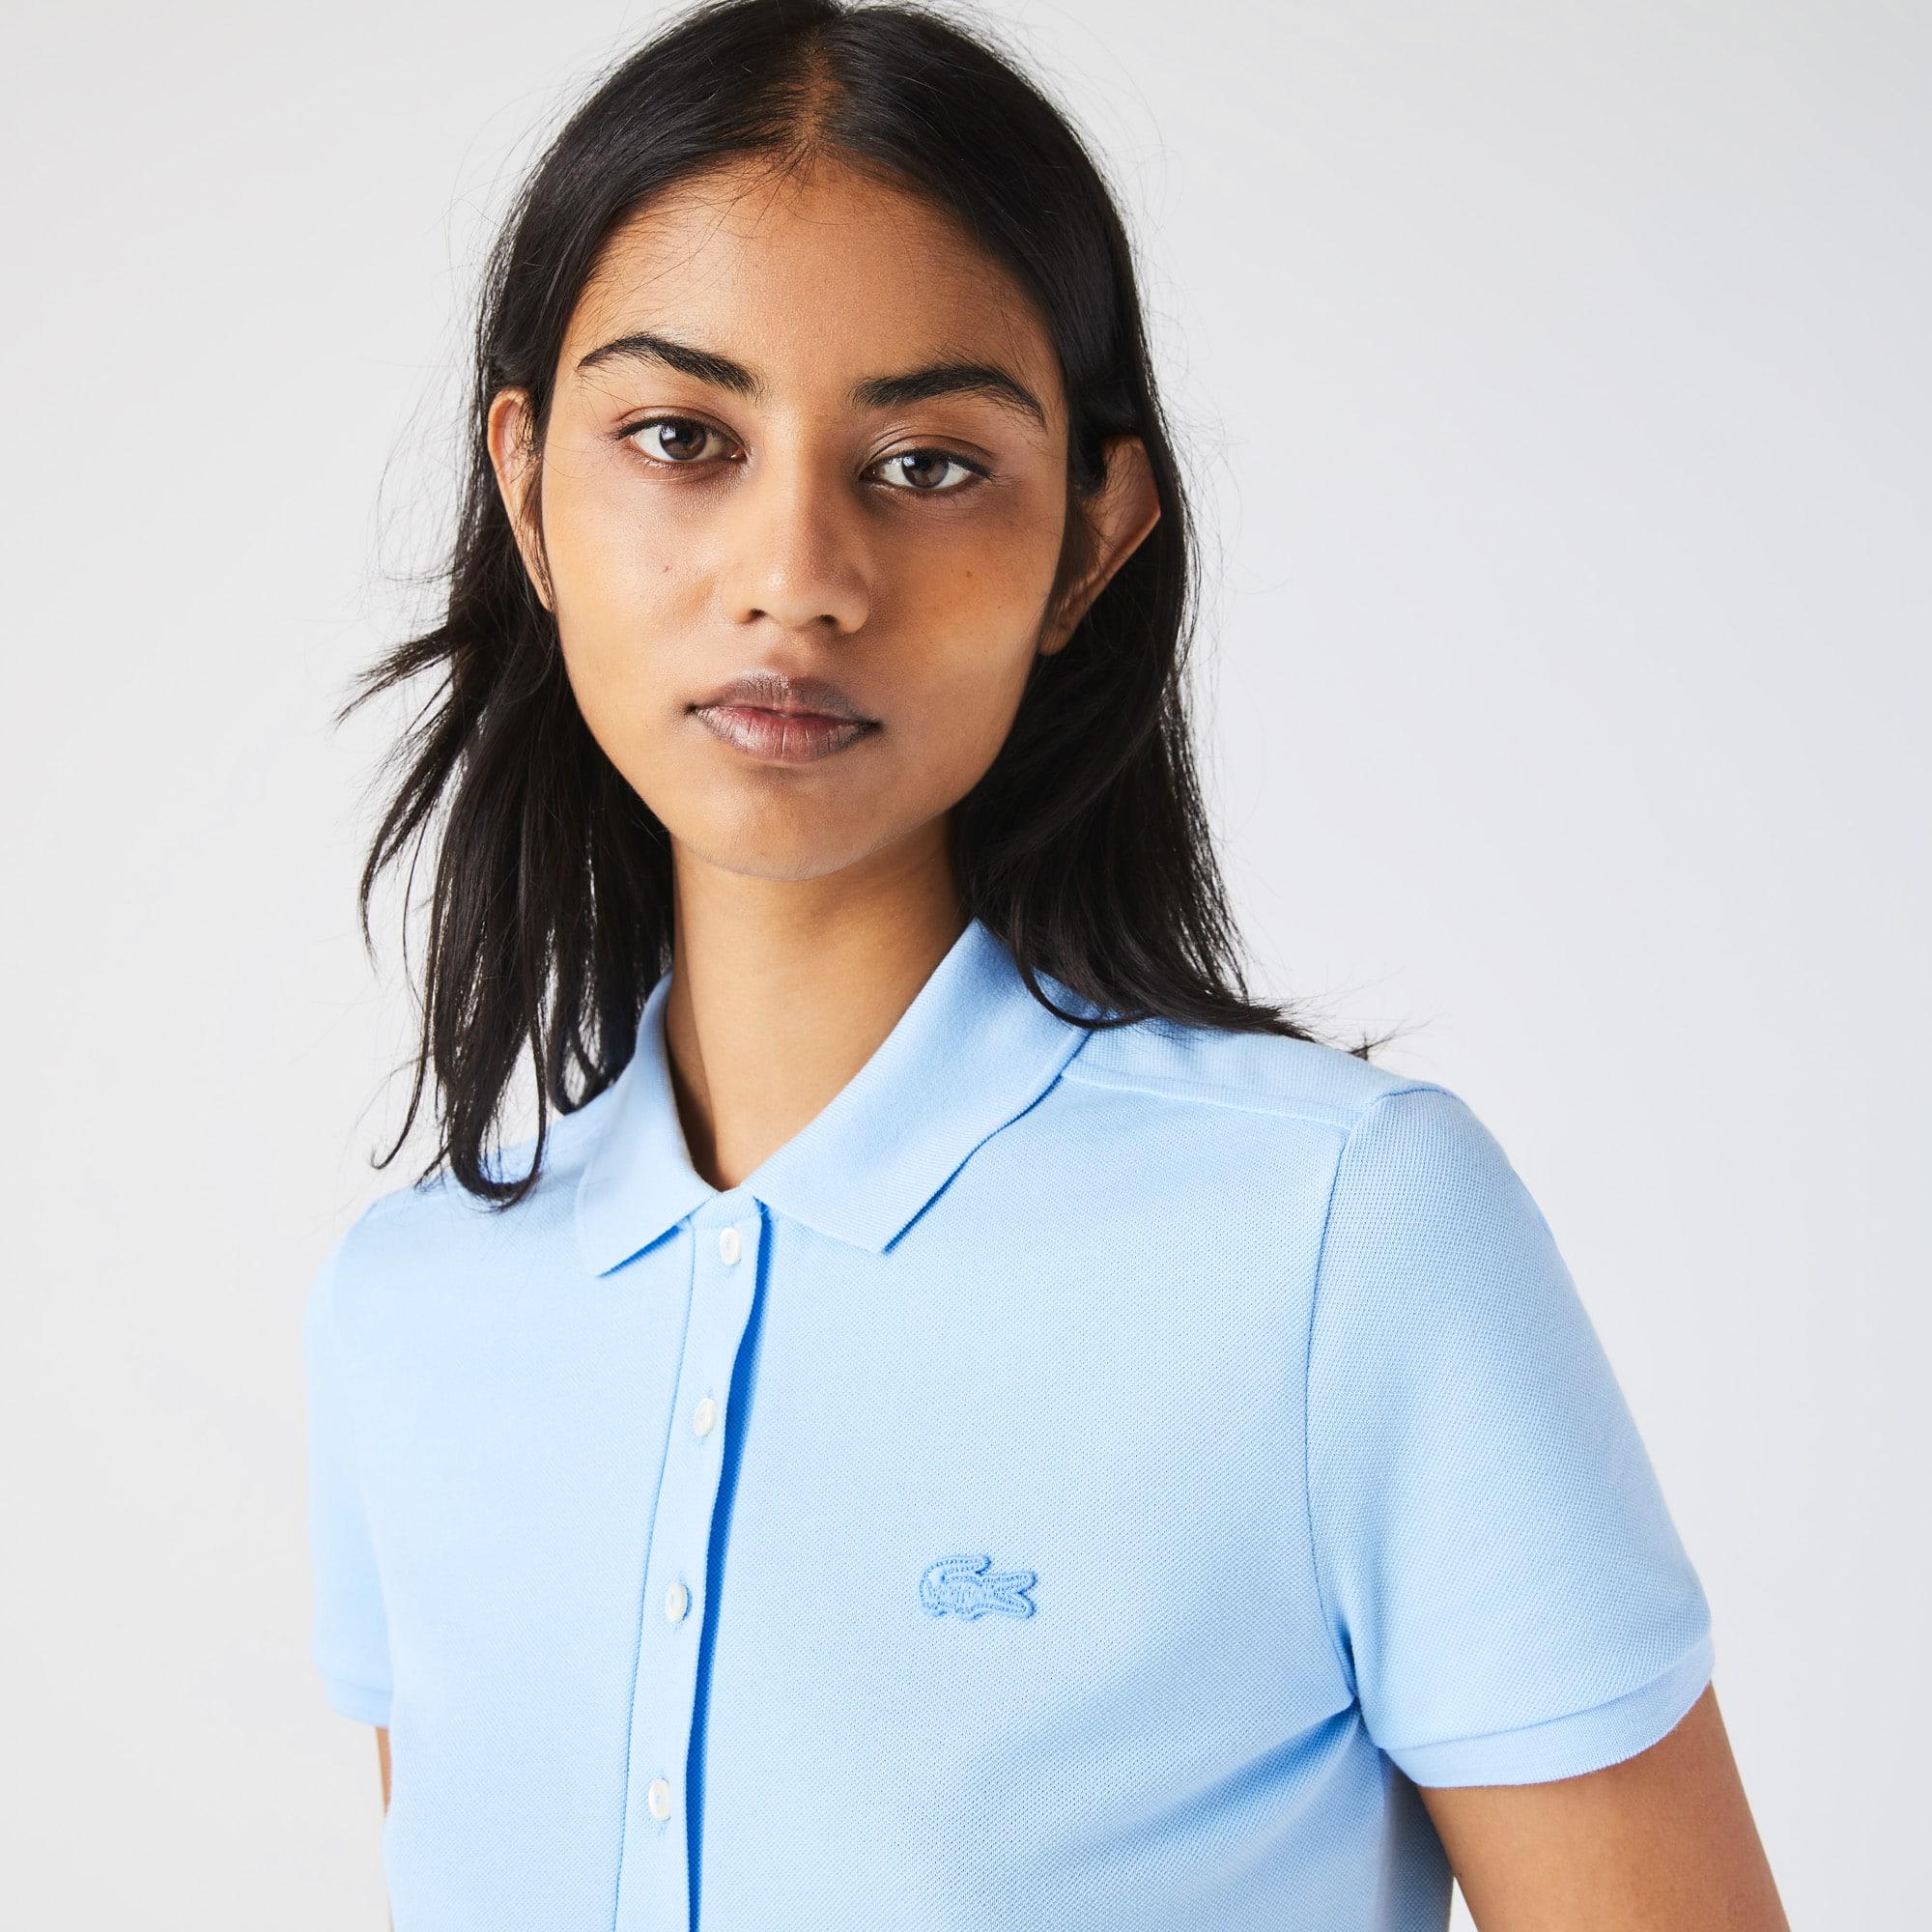 Womens Lacoste Slim fit Stretch Cotton Pique Polo Shirt